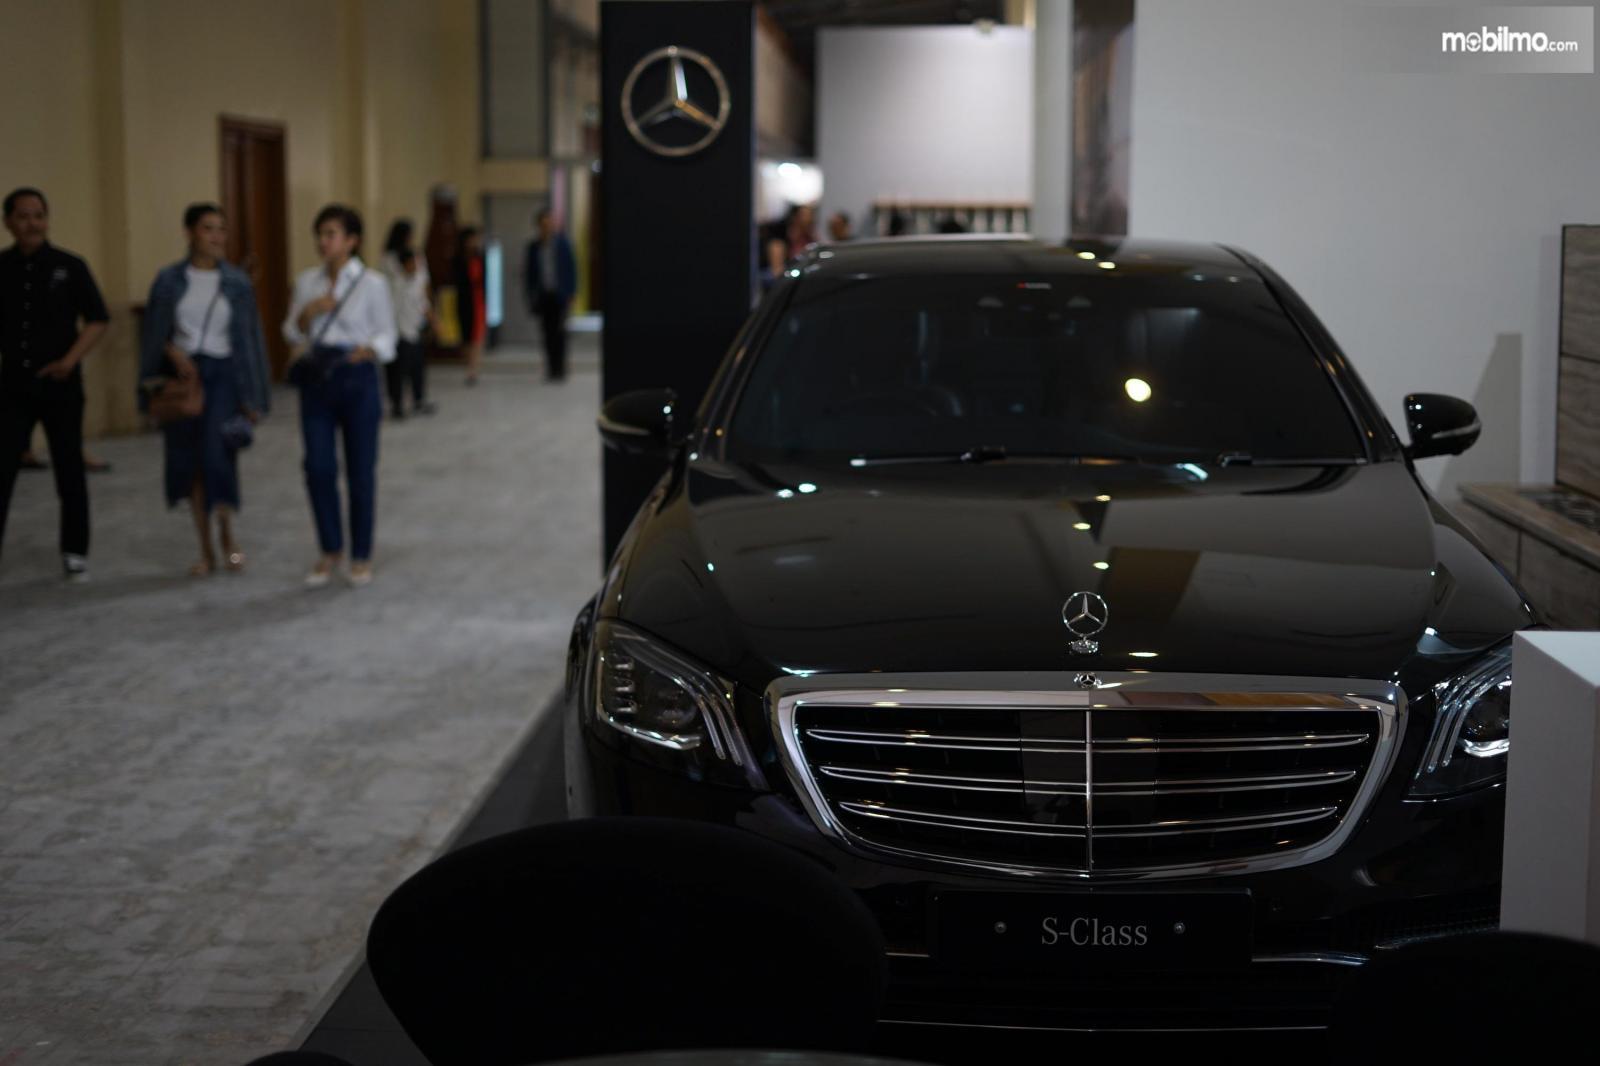 Foto mobil Mercedes-Benz selama Art Jakarta 2019